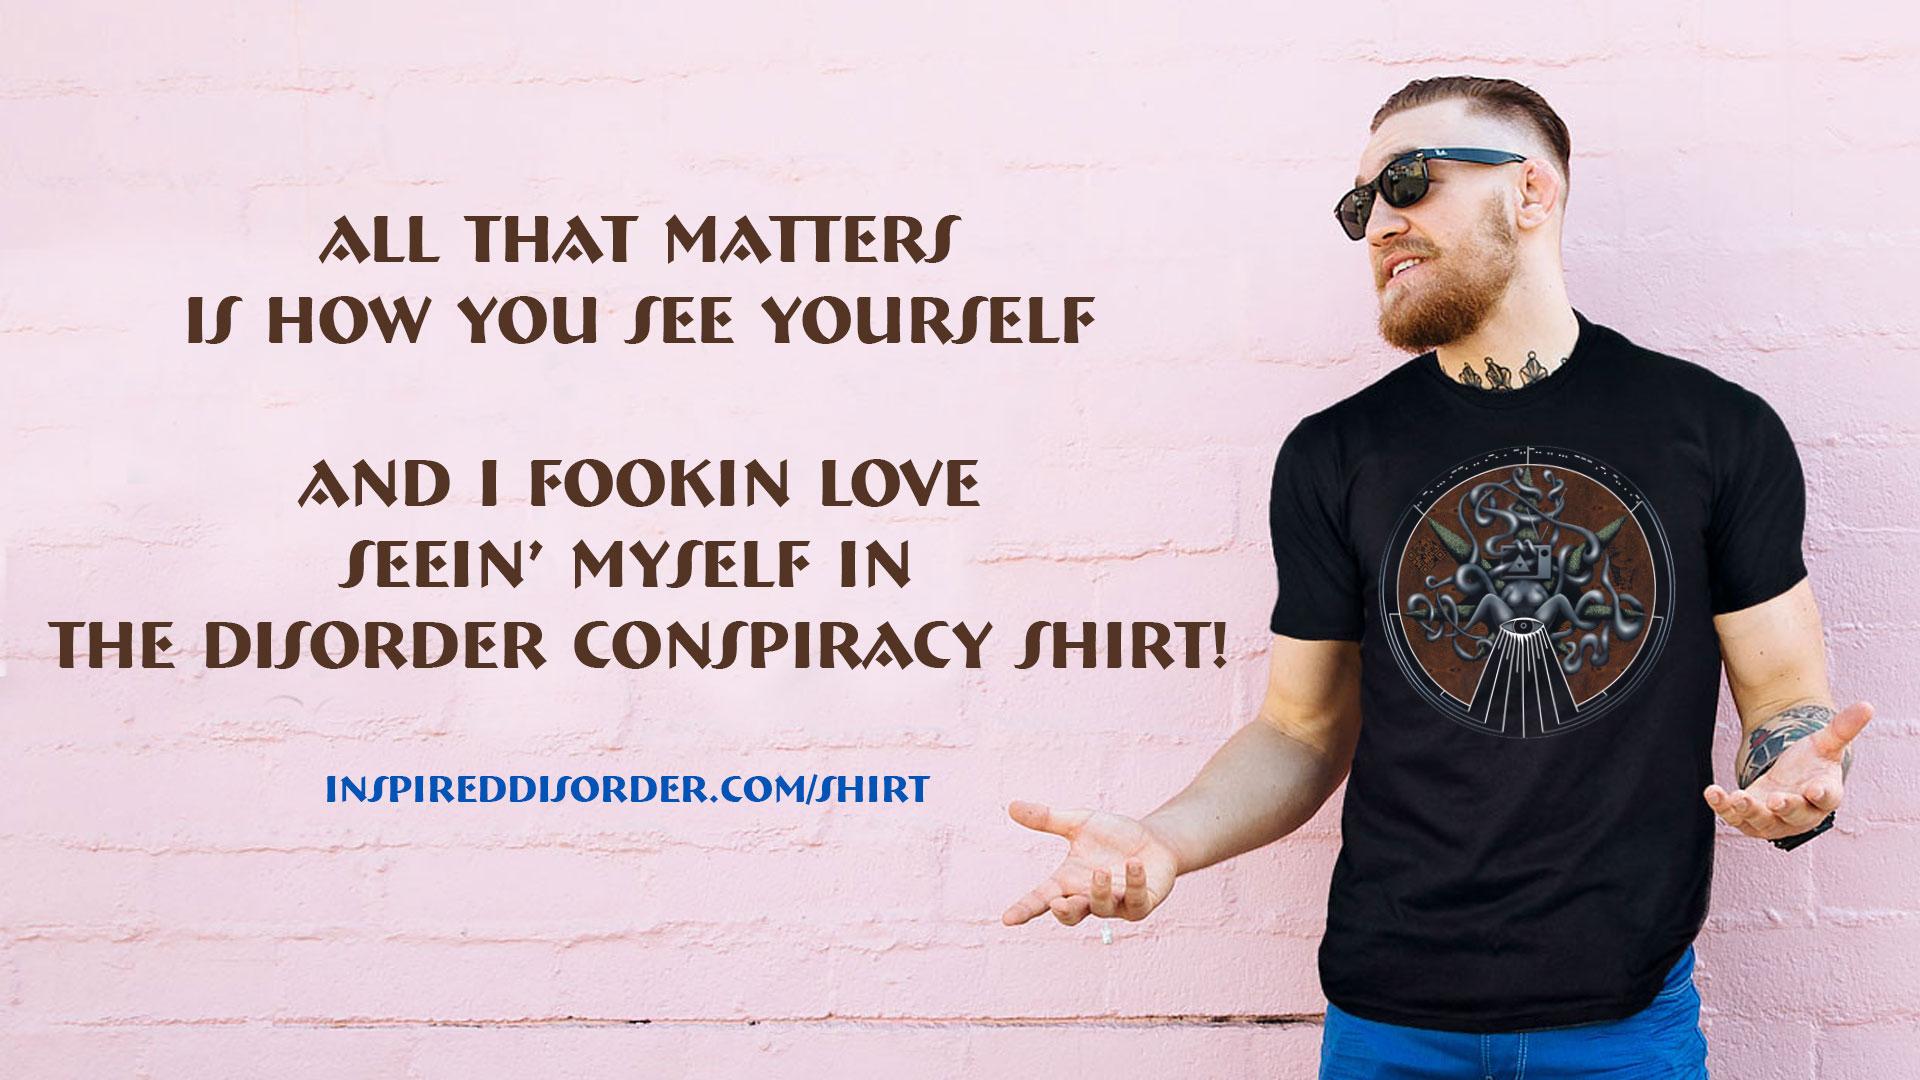 DisorderConspiracy-Conor.jpg